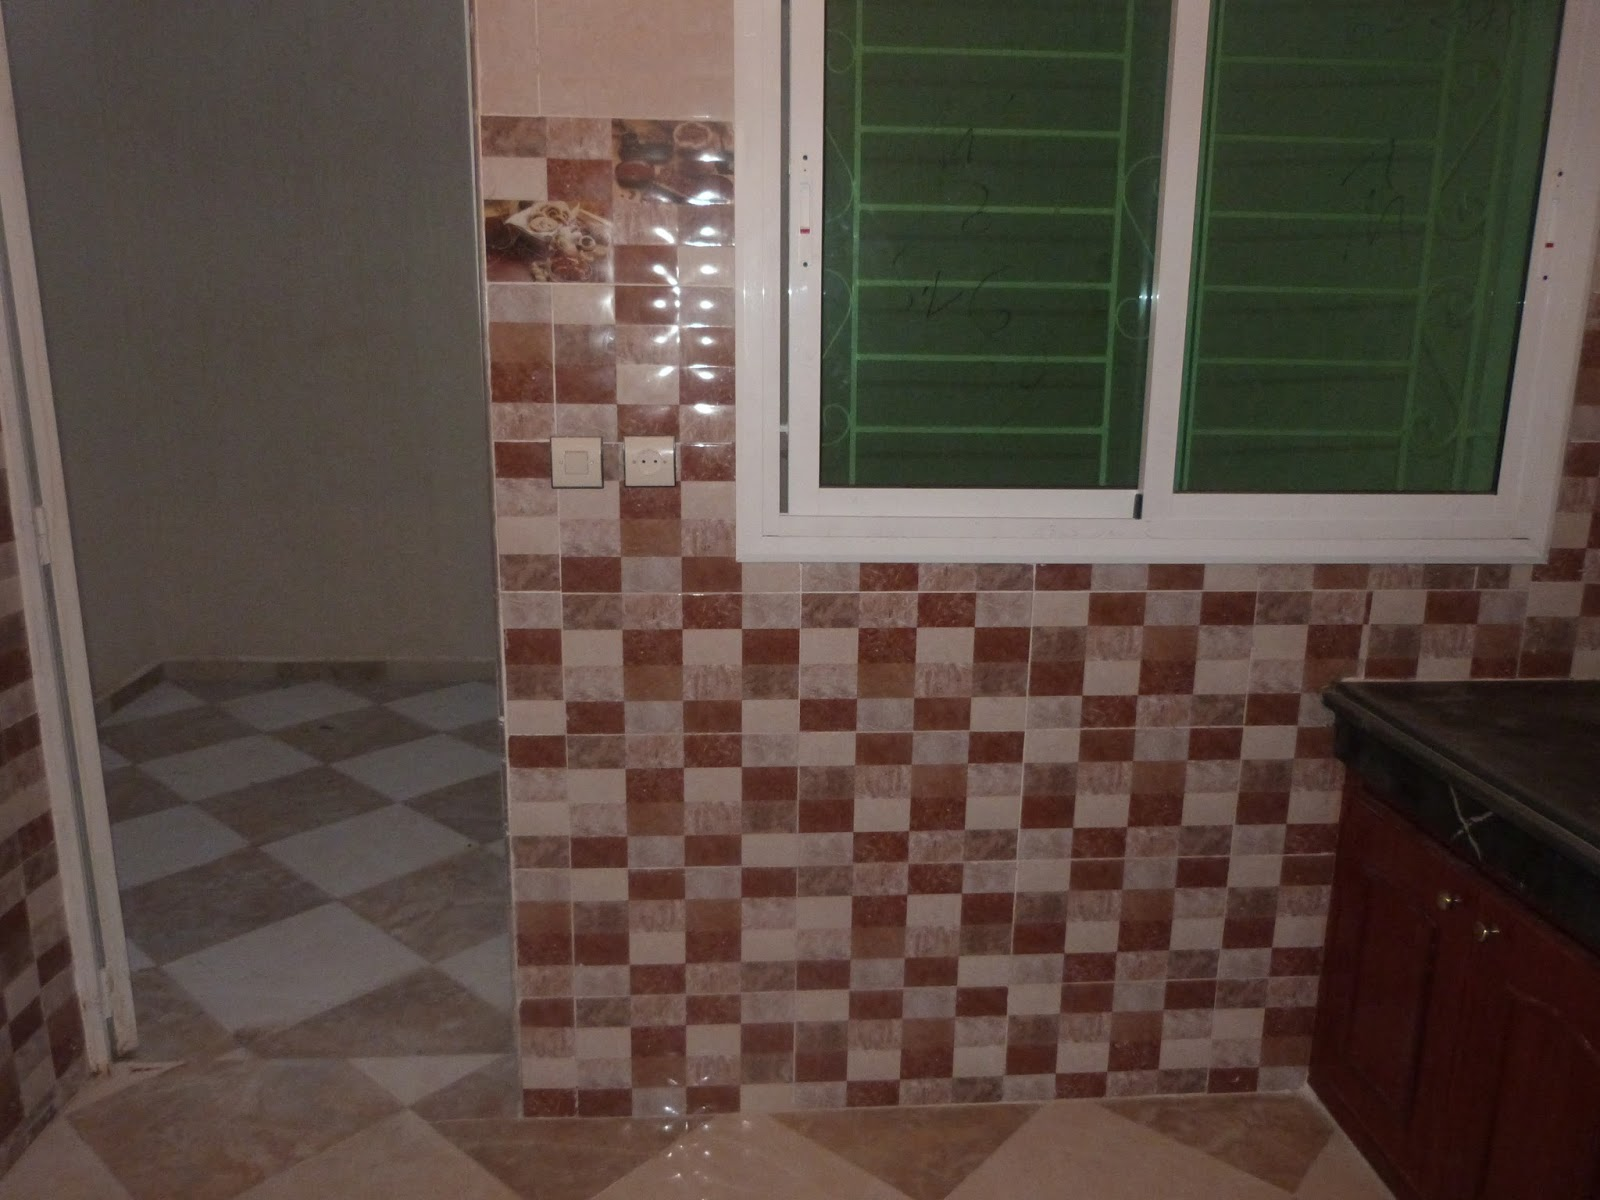 Carrelage Mural Salle De Bain Autocollant ~ appartement kenitra el hddada 86m immokenitra4 porte immobilier